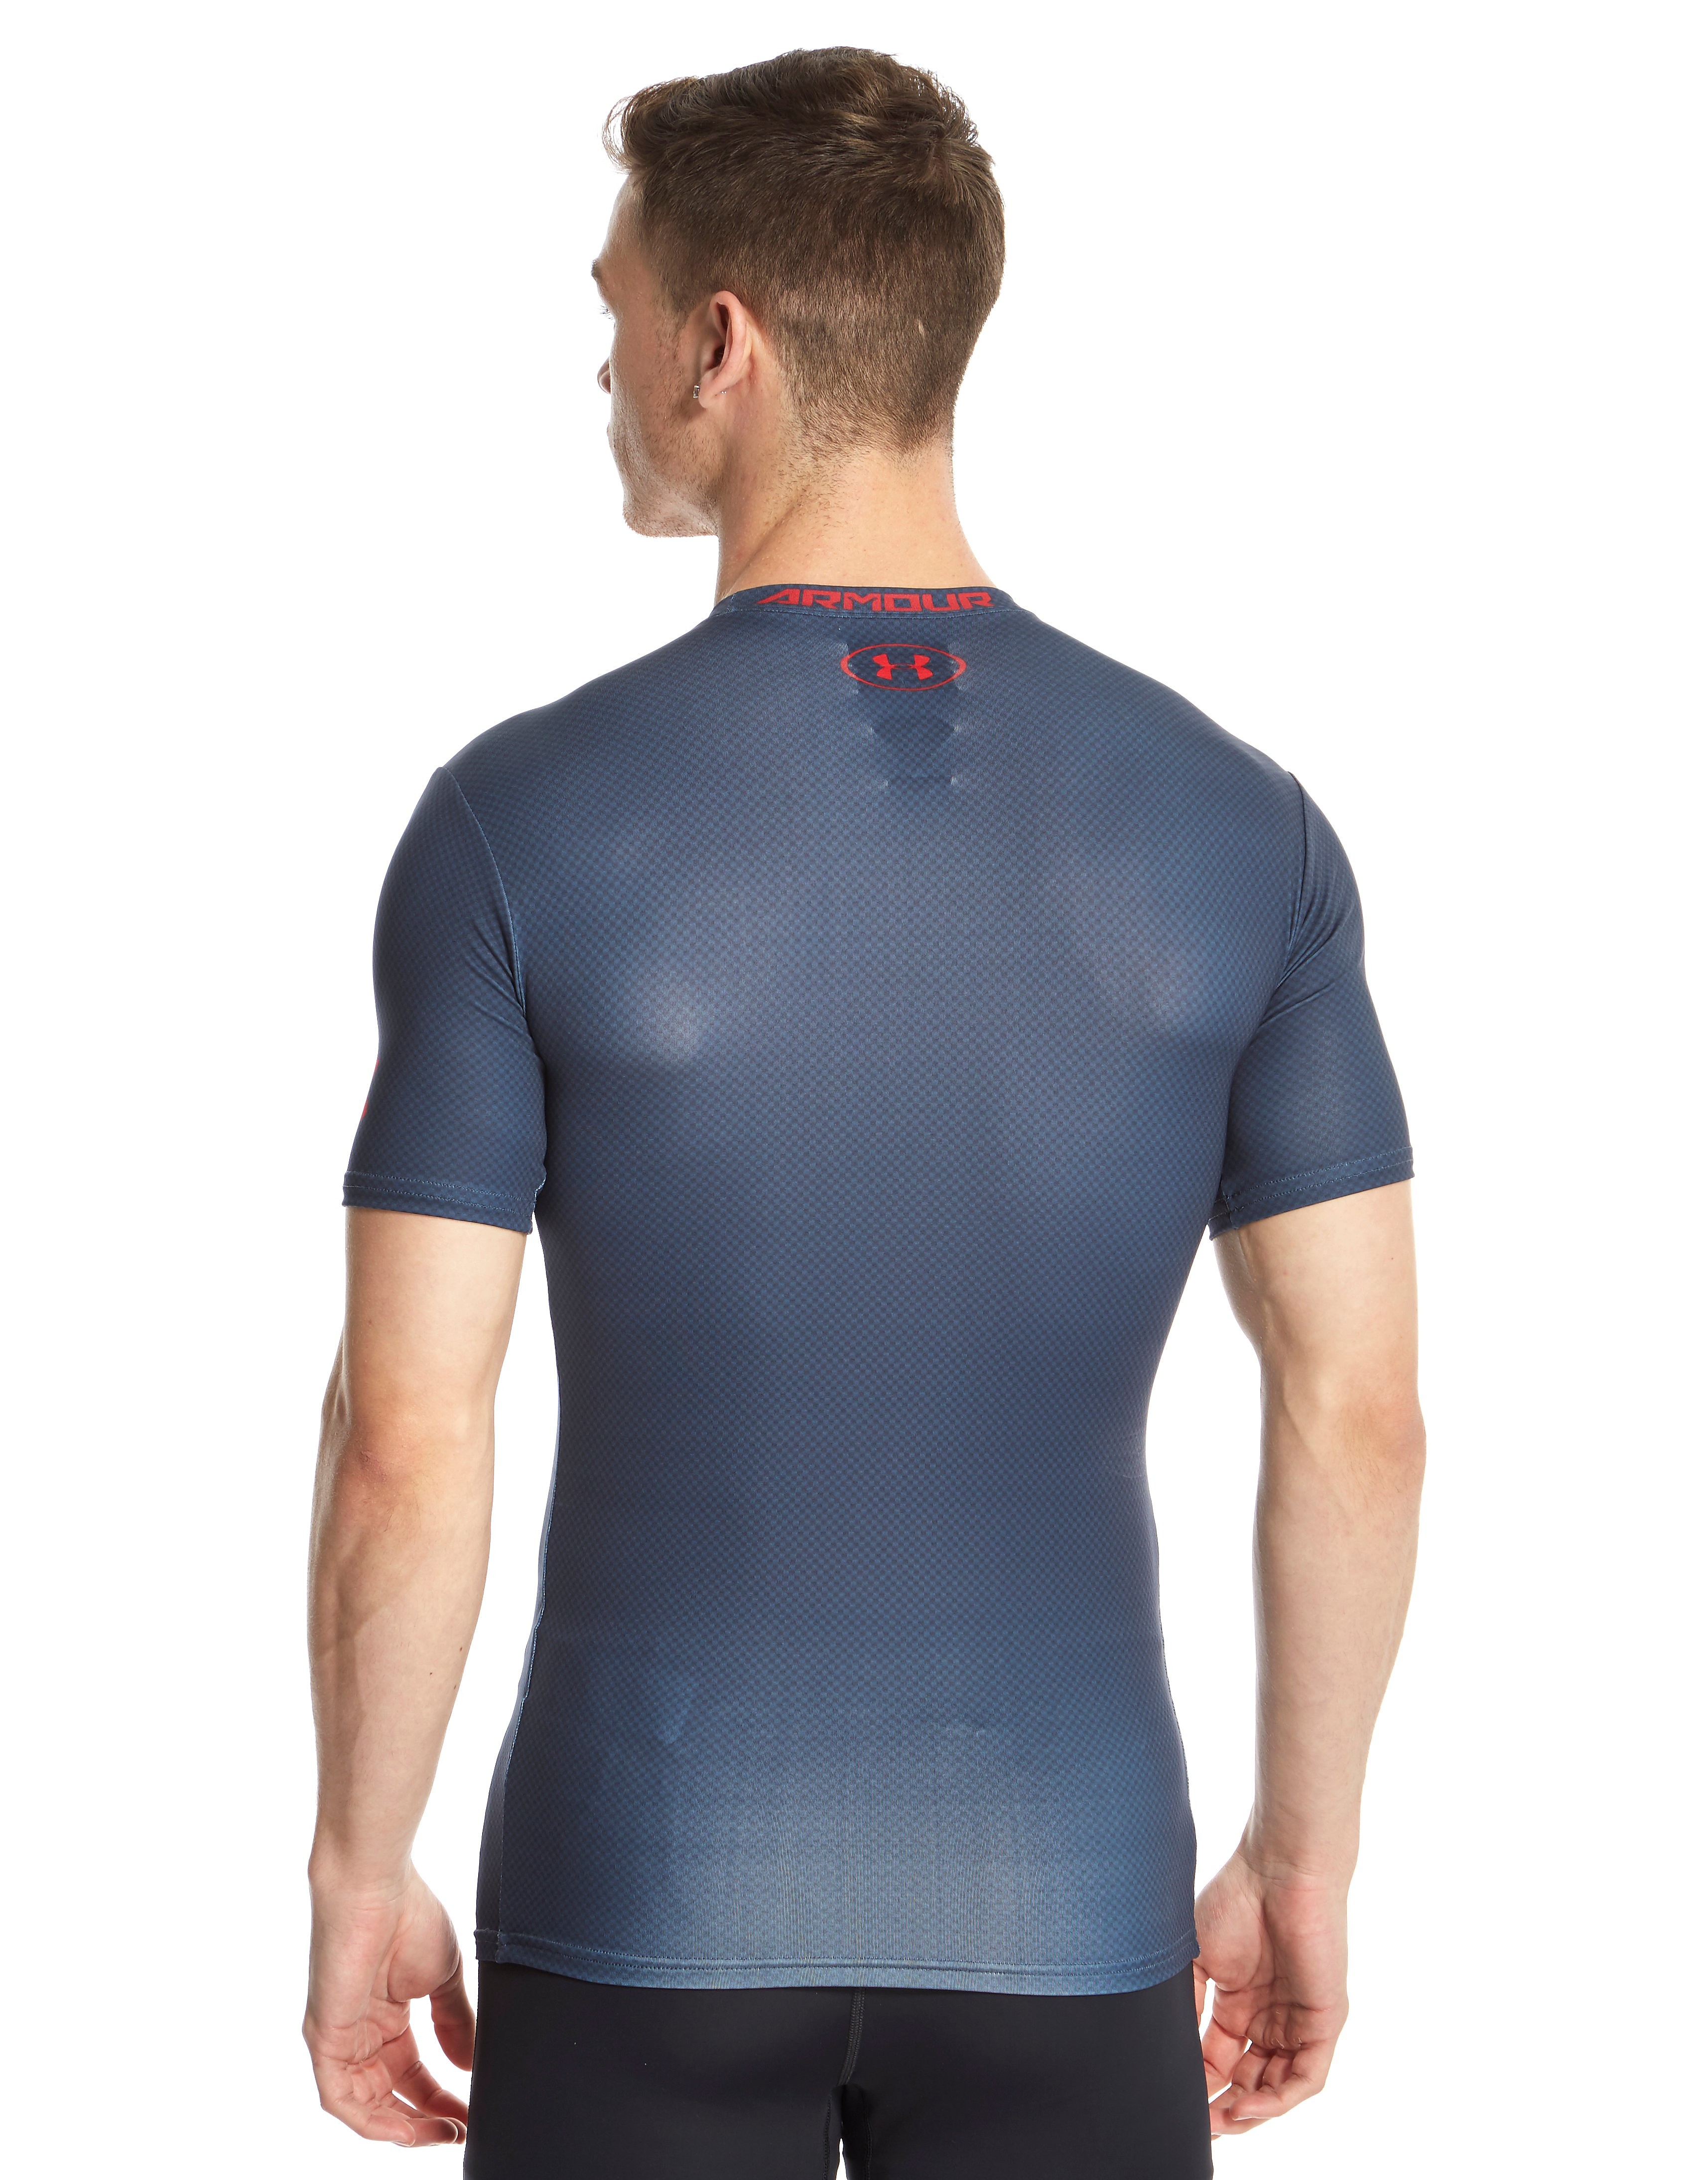 Under Armour Superman 2.0 Compression Shirt